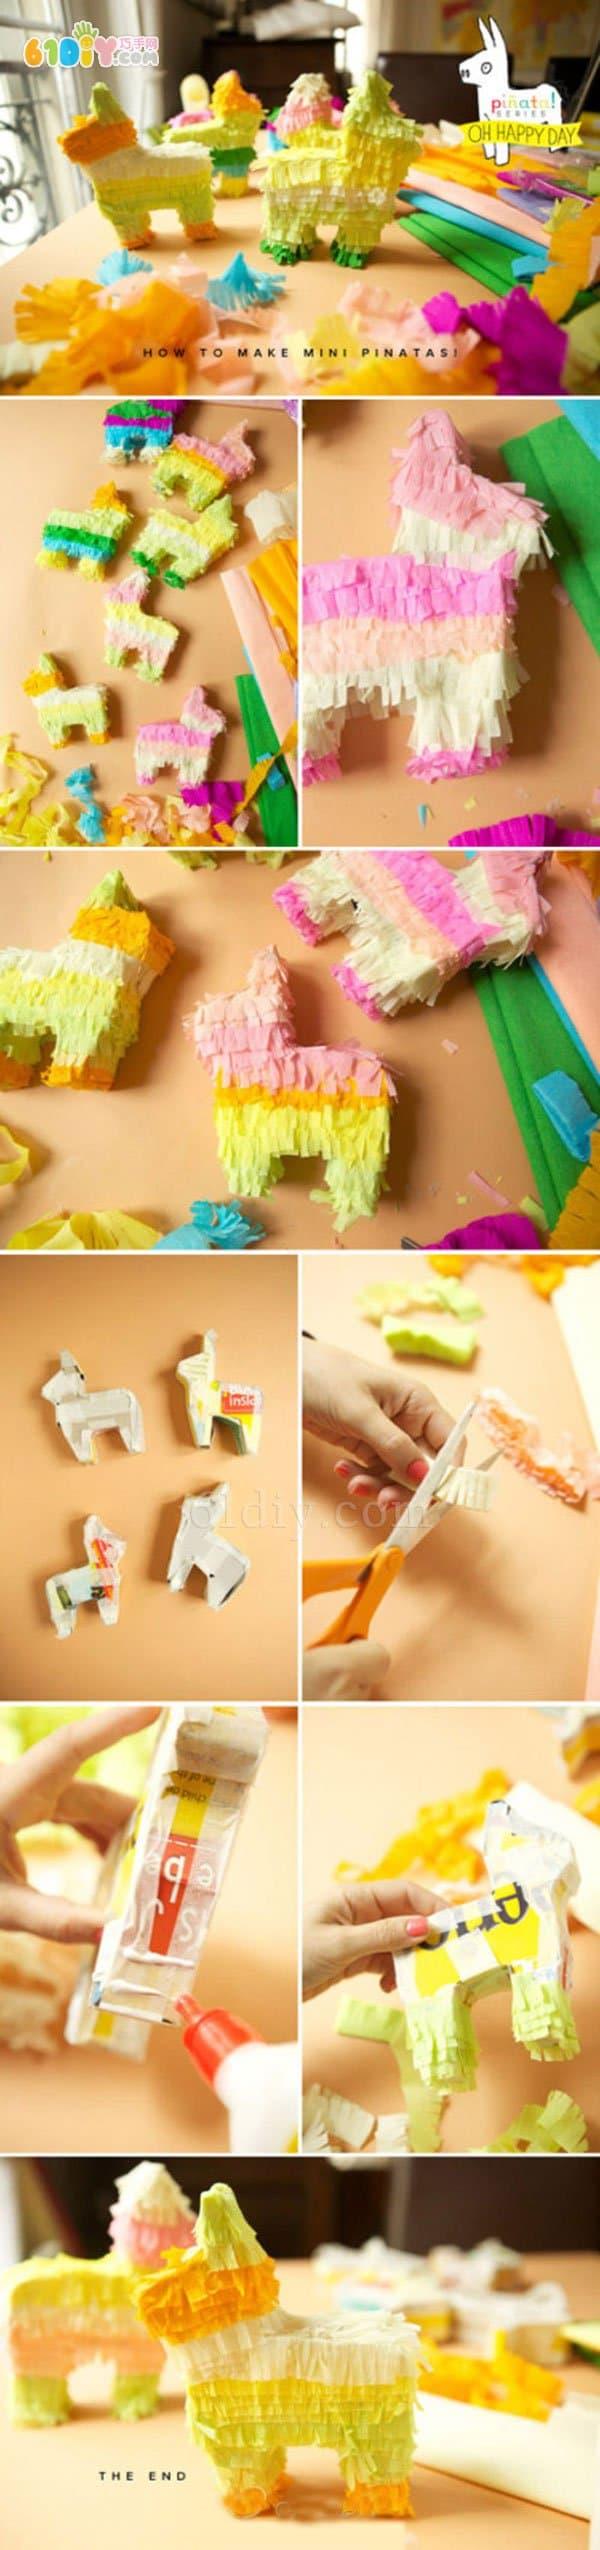 Three-dimensional pony manual tutorial